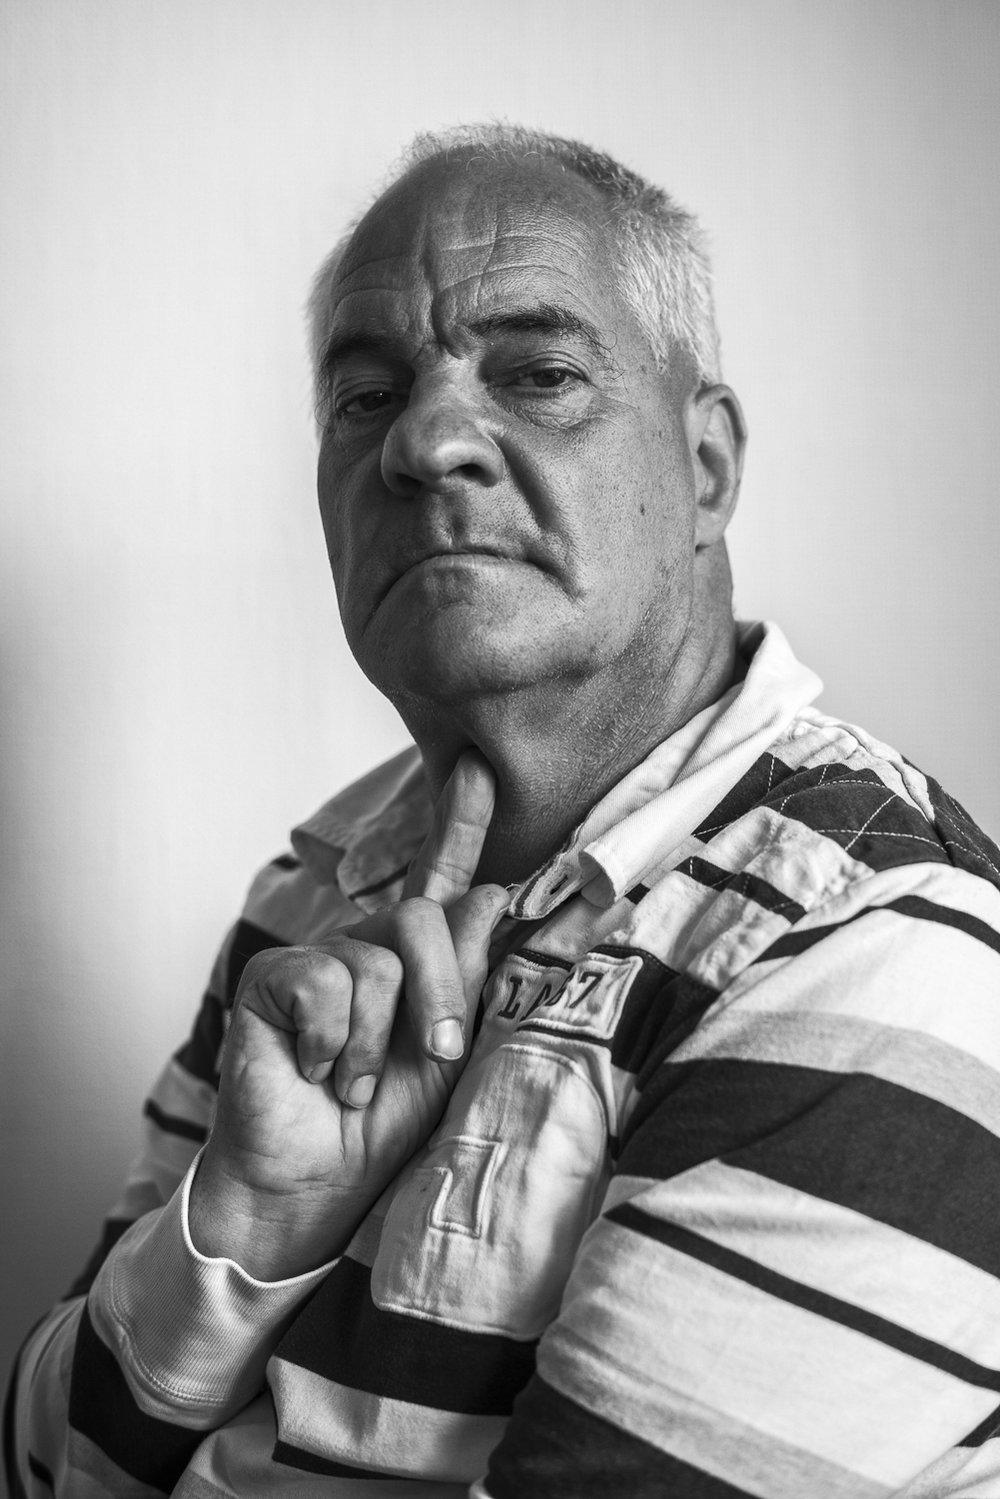 Piet Schopping